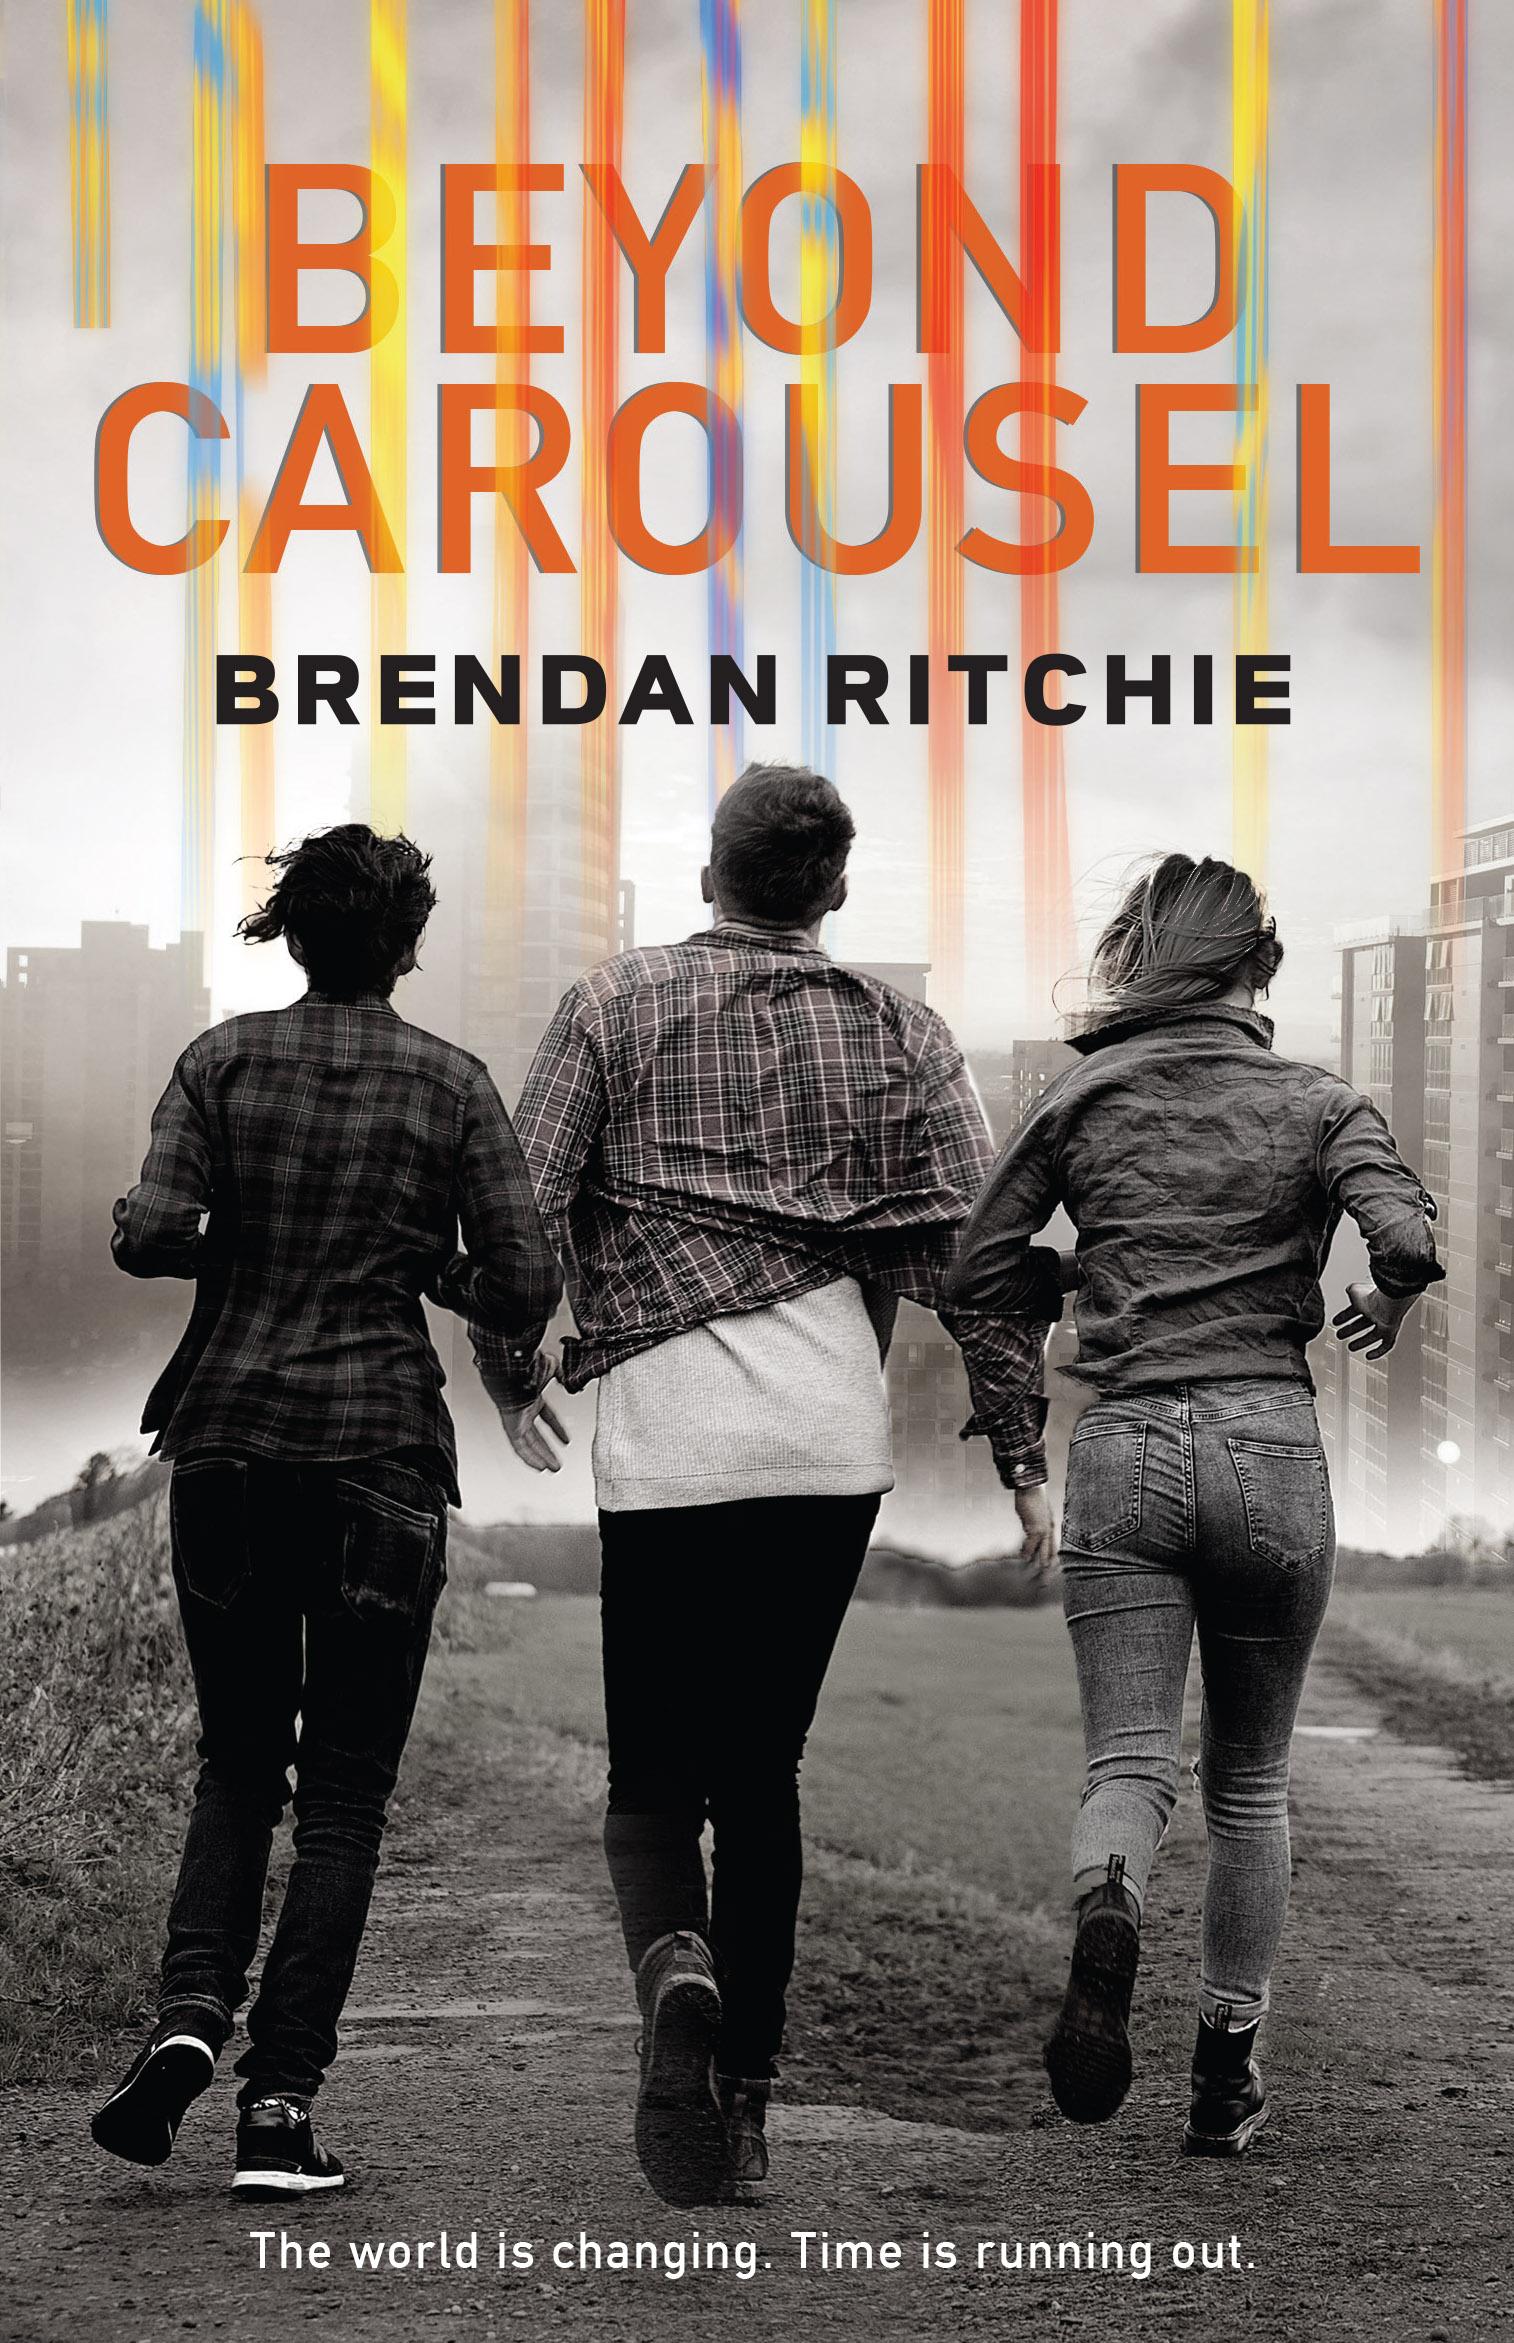 Beyond Carousel by Brendan Ritchie